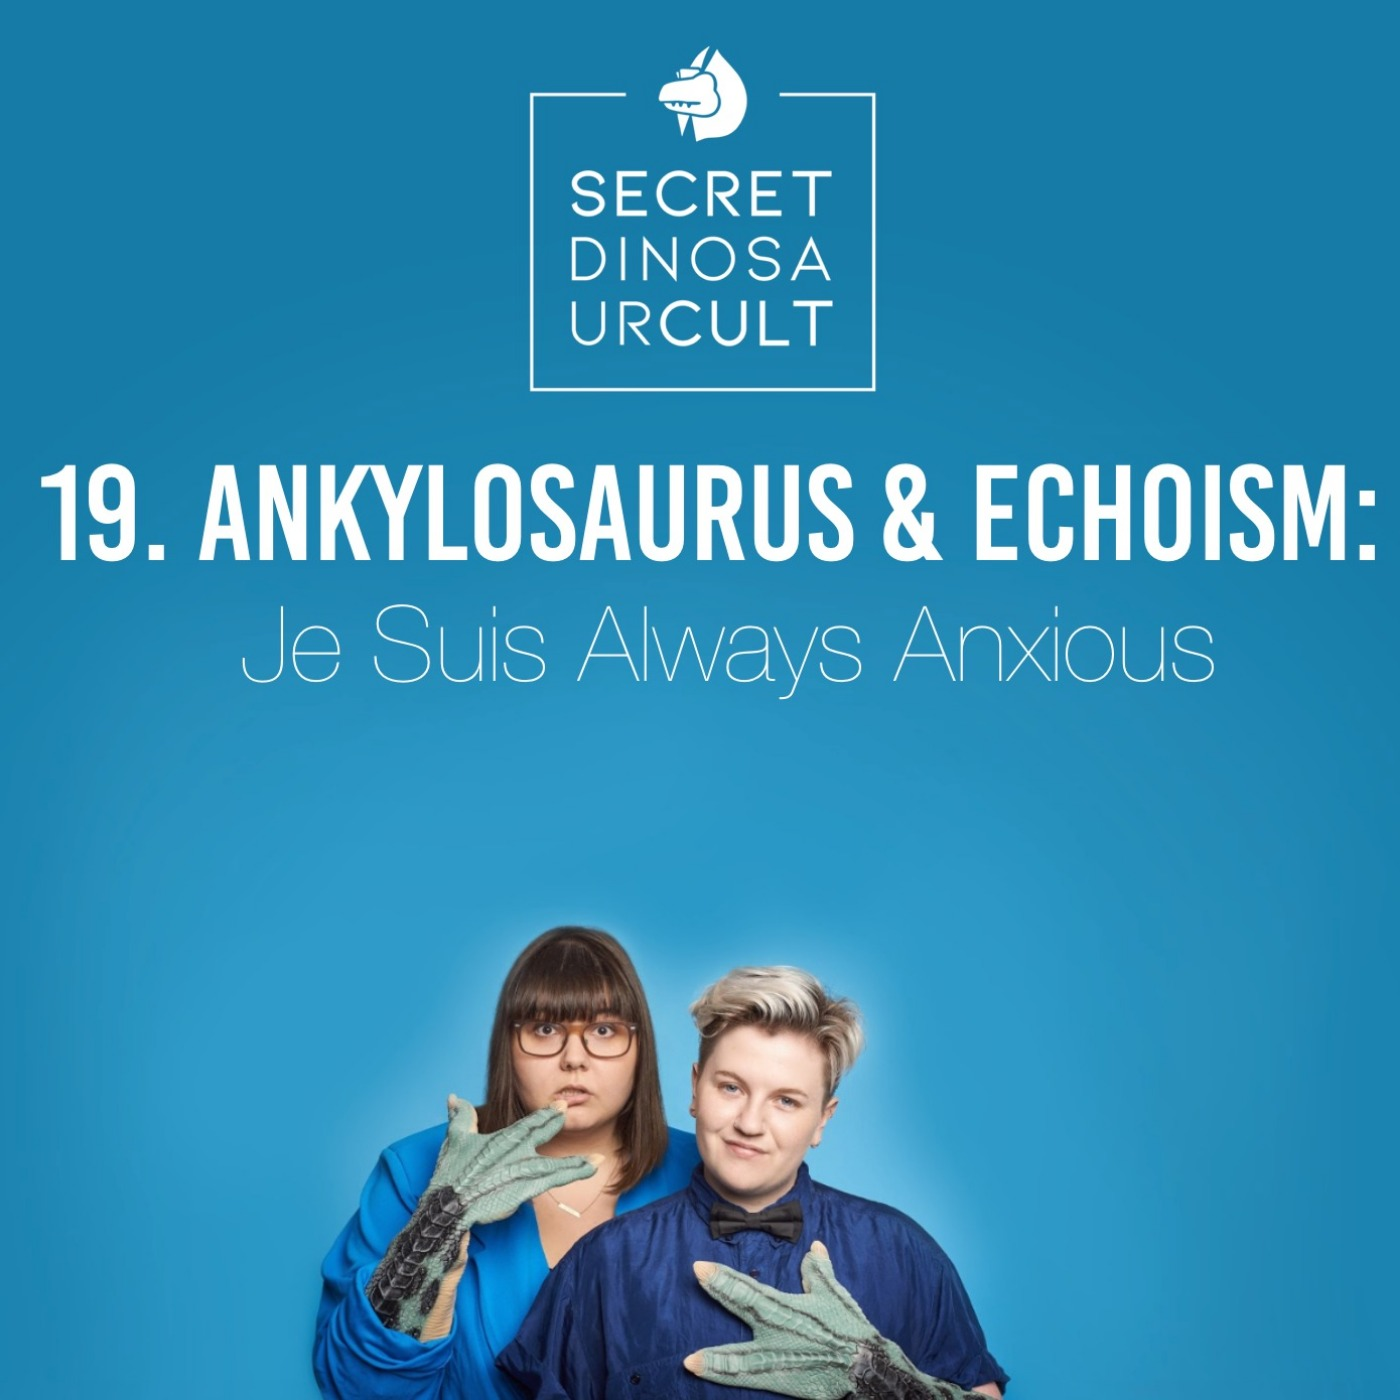 19. Ankylosaurus & Echoism: Je Suis Always Anxious